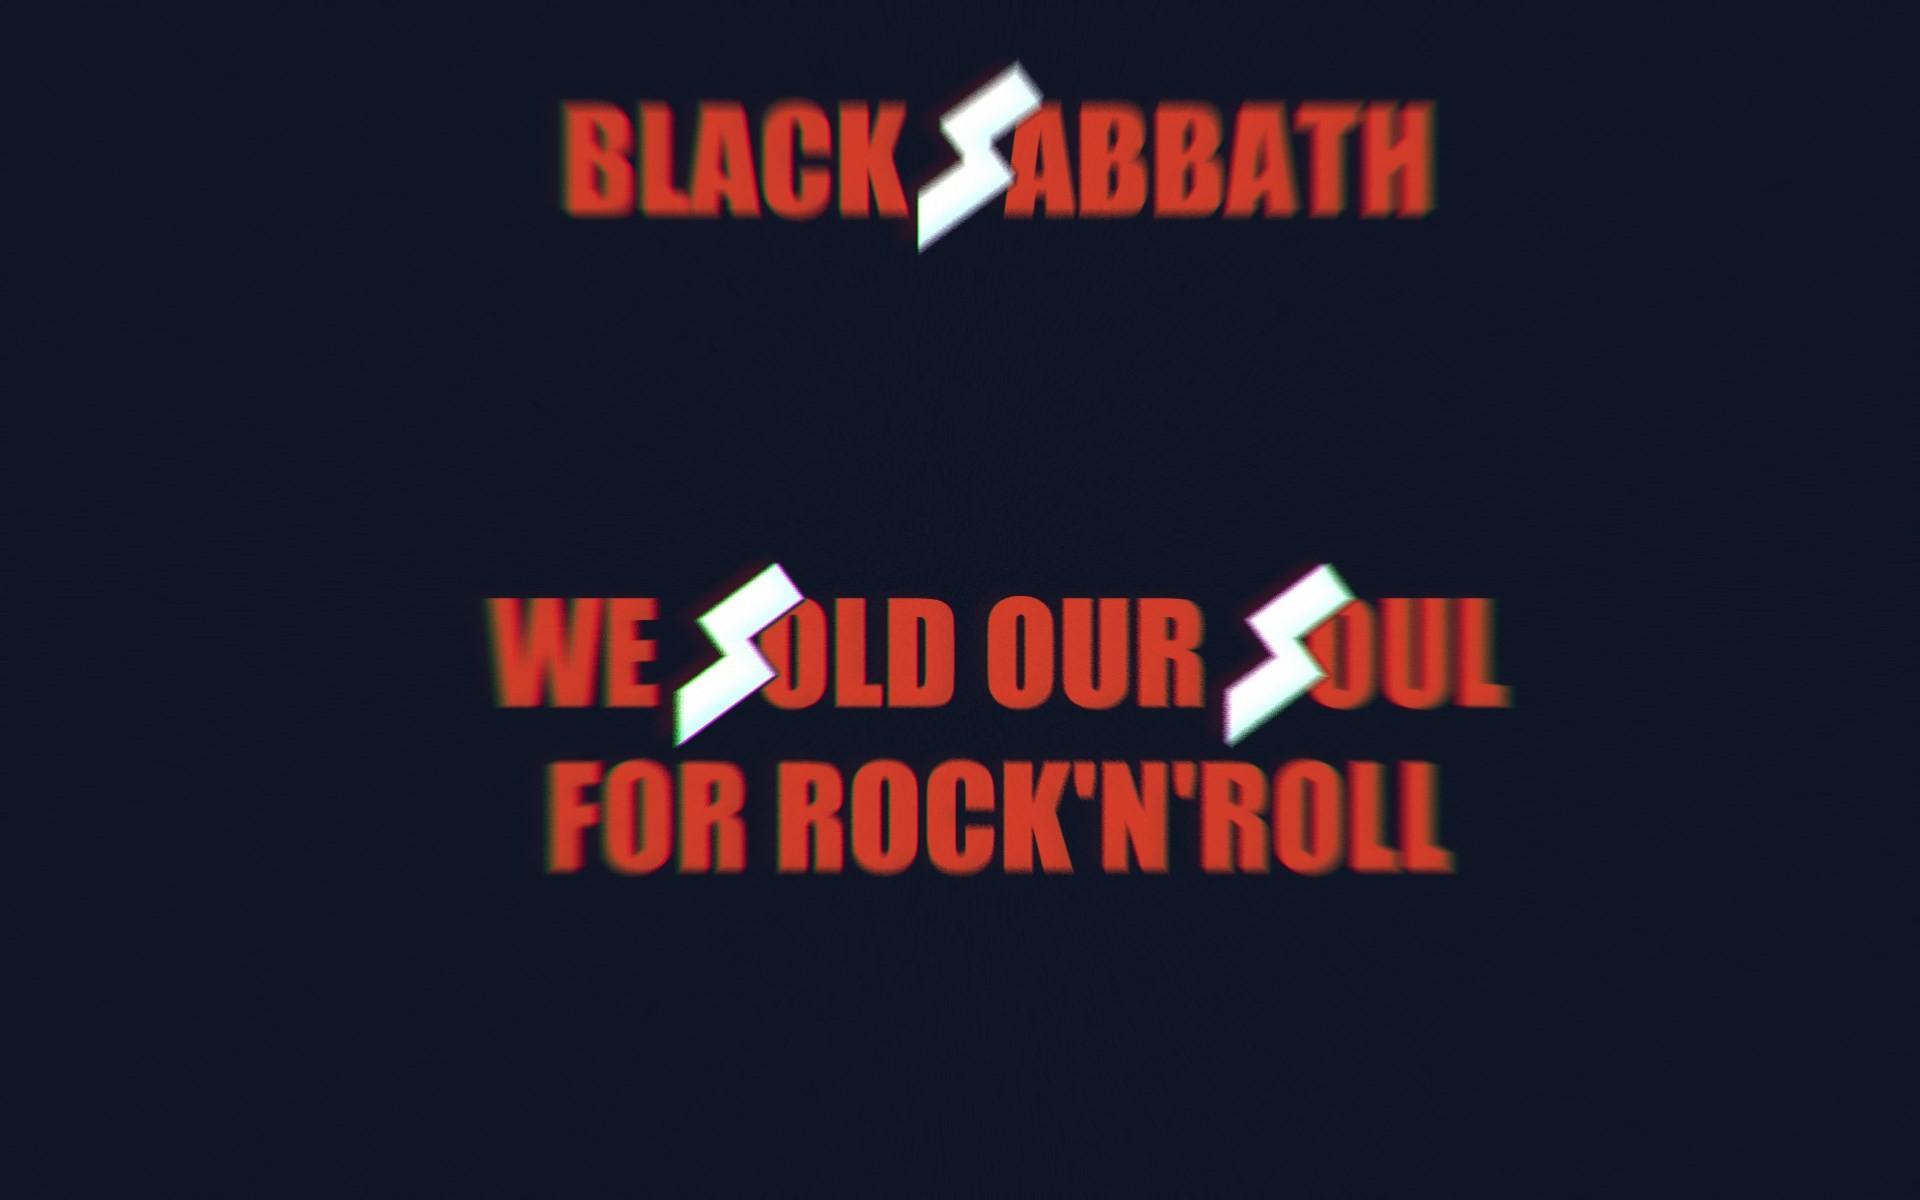 Black Sabbath Wallpapers ·â'